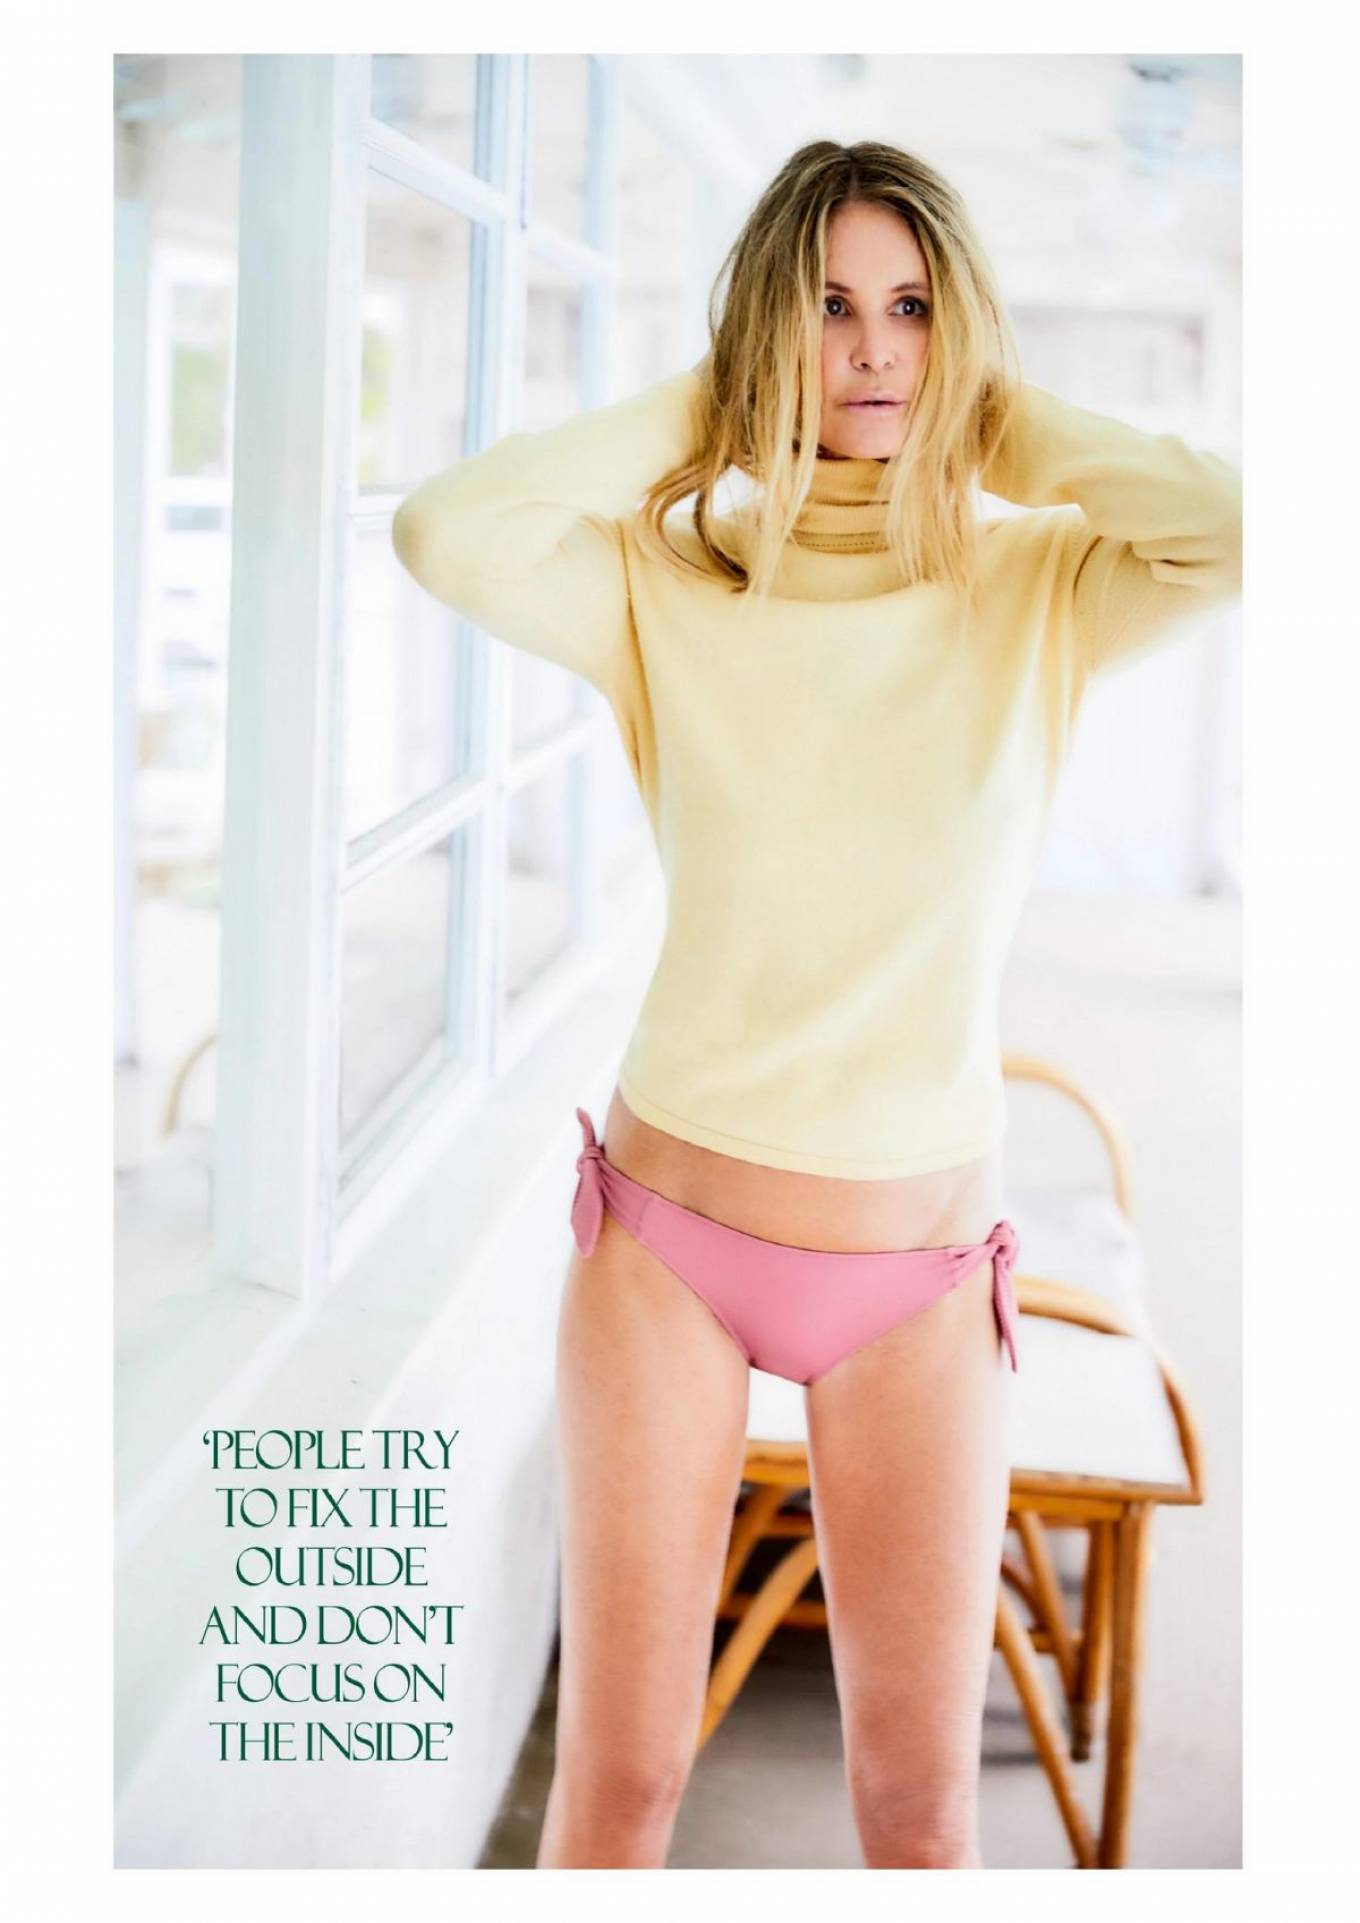 Elle MacPherson 2020 : Elle MacPherson – Red Magazine (UK – August 2020 isseu)-05